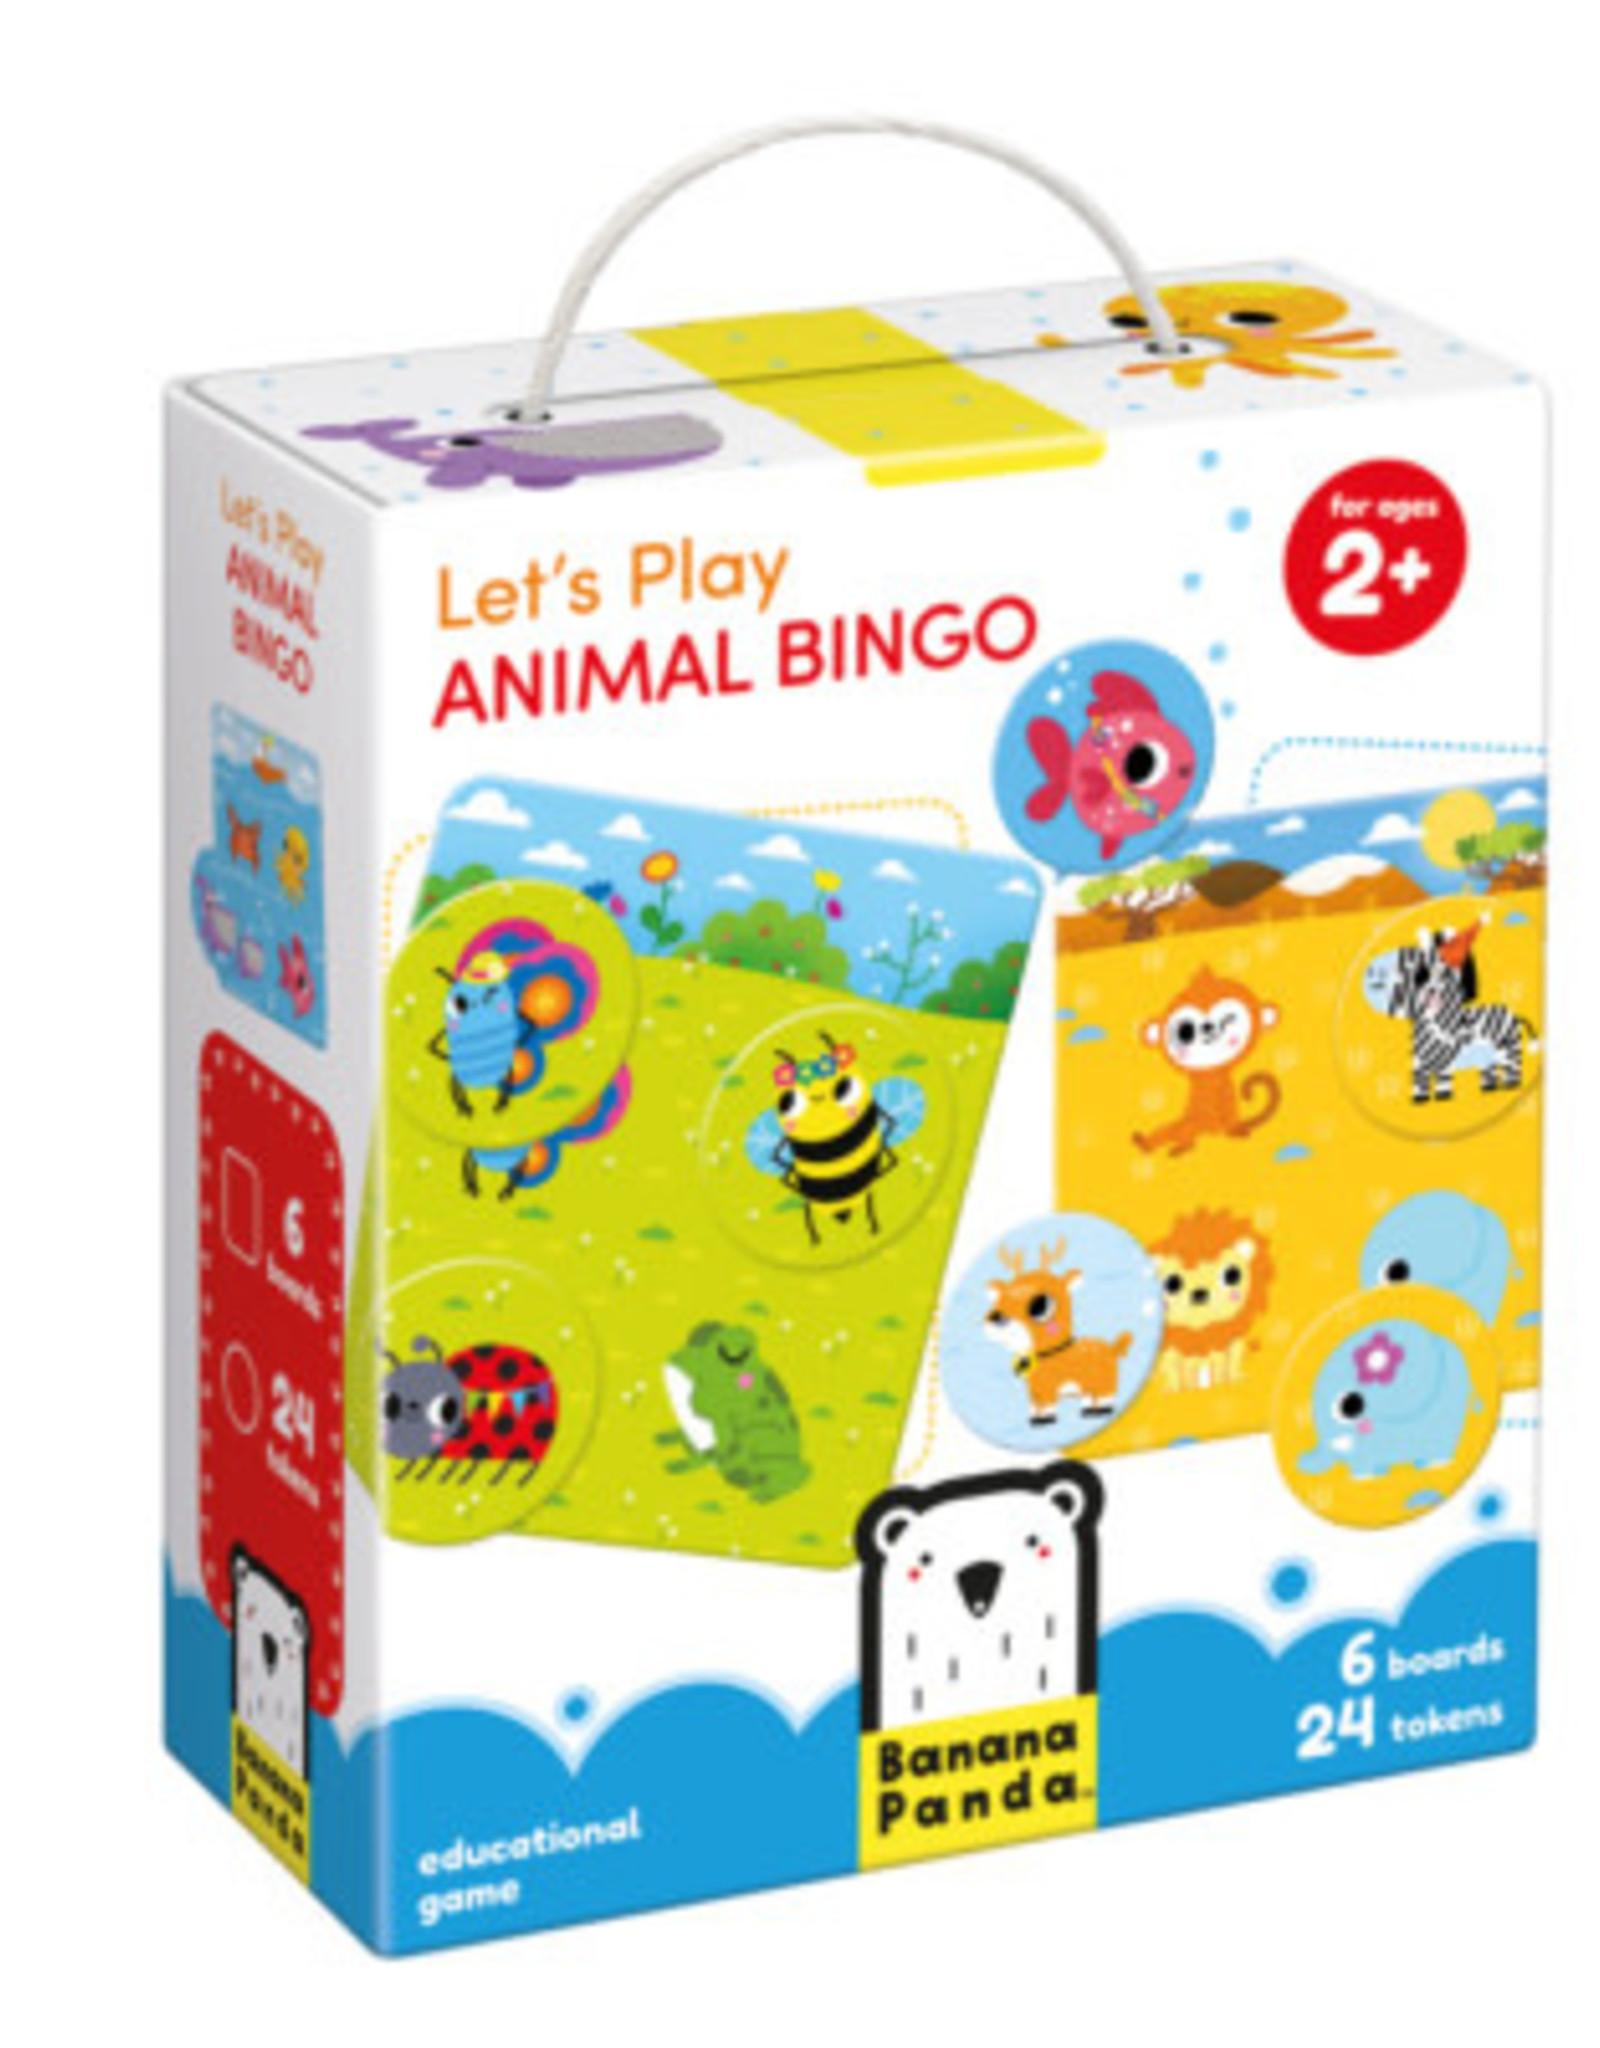 Banana Panda Let's Play Animal Bingo